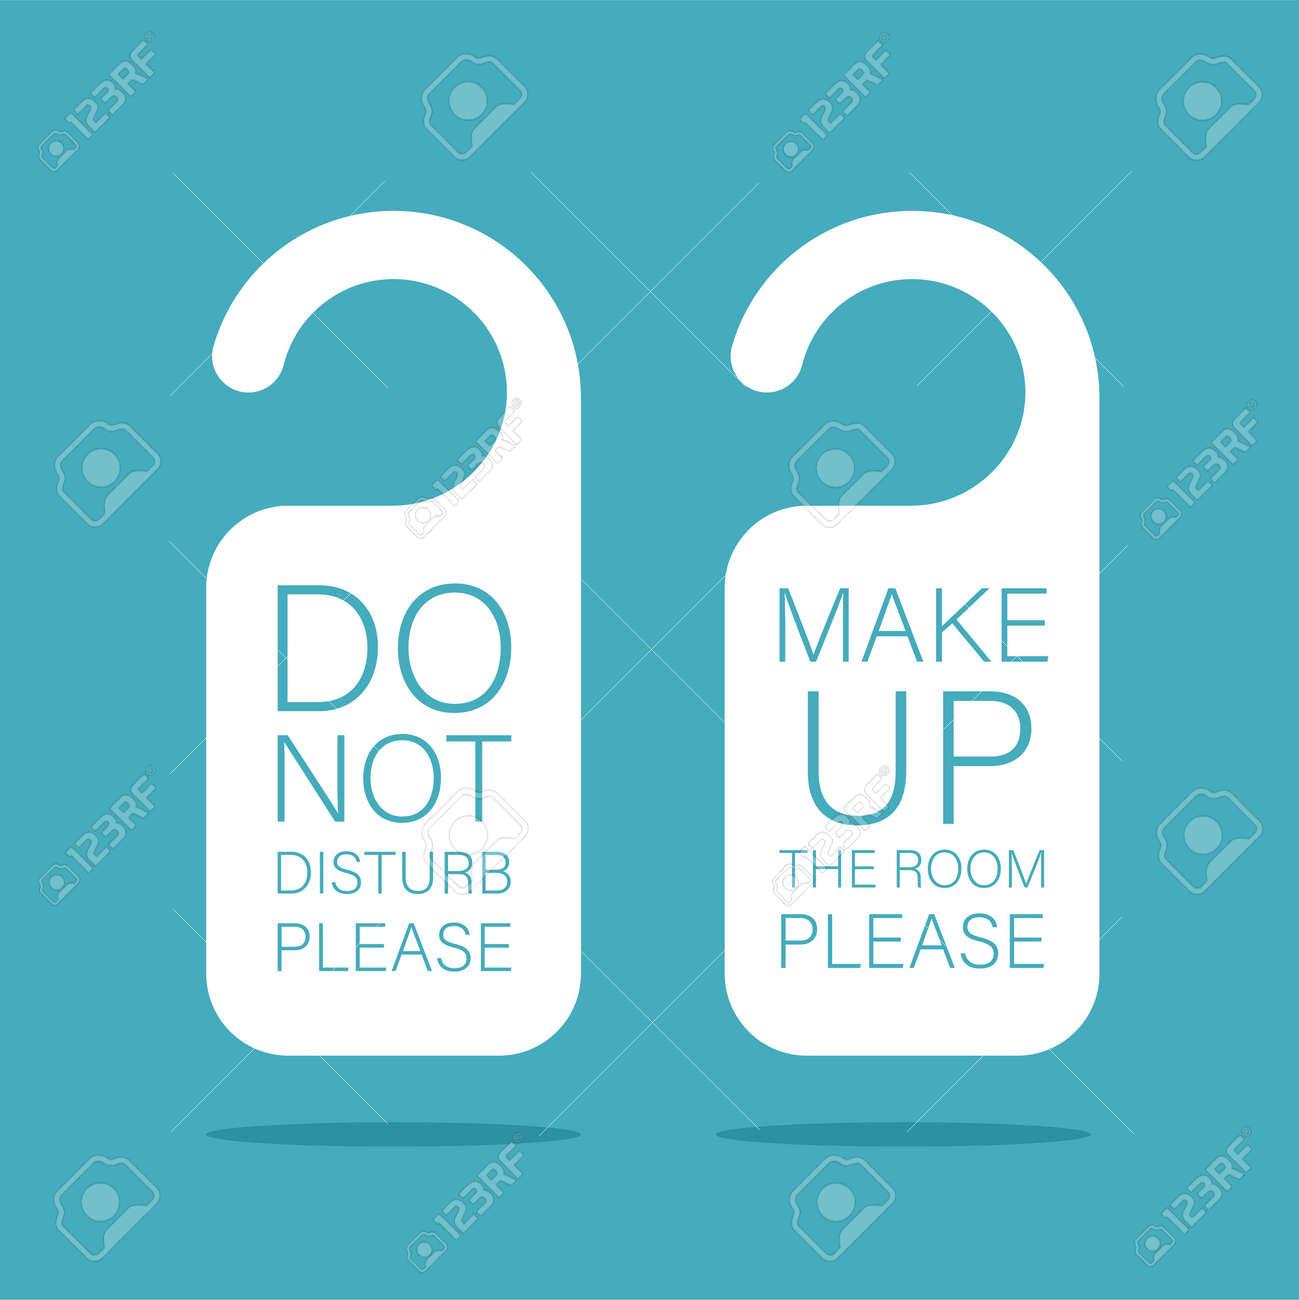 Door knob warning hangers set. Do not disturb and make up the room. Door signs template. Vector illustration isolated. - 169877664